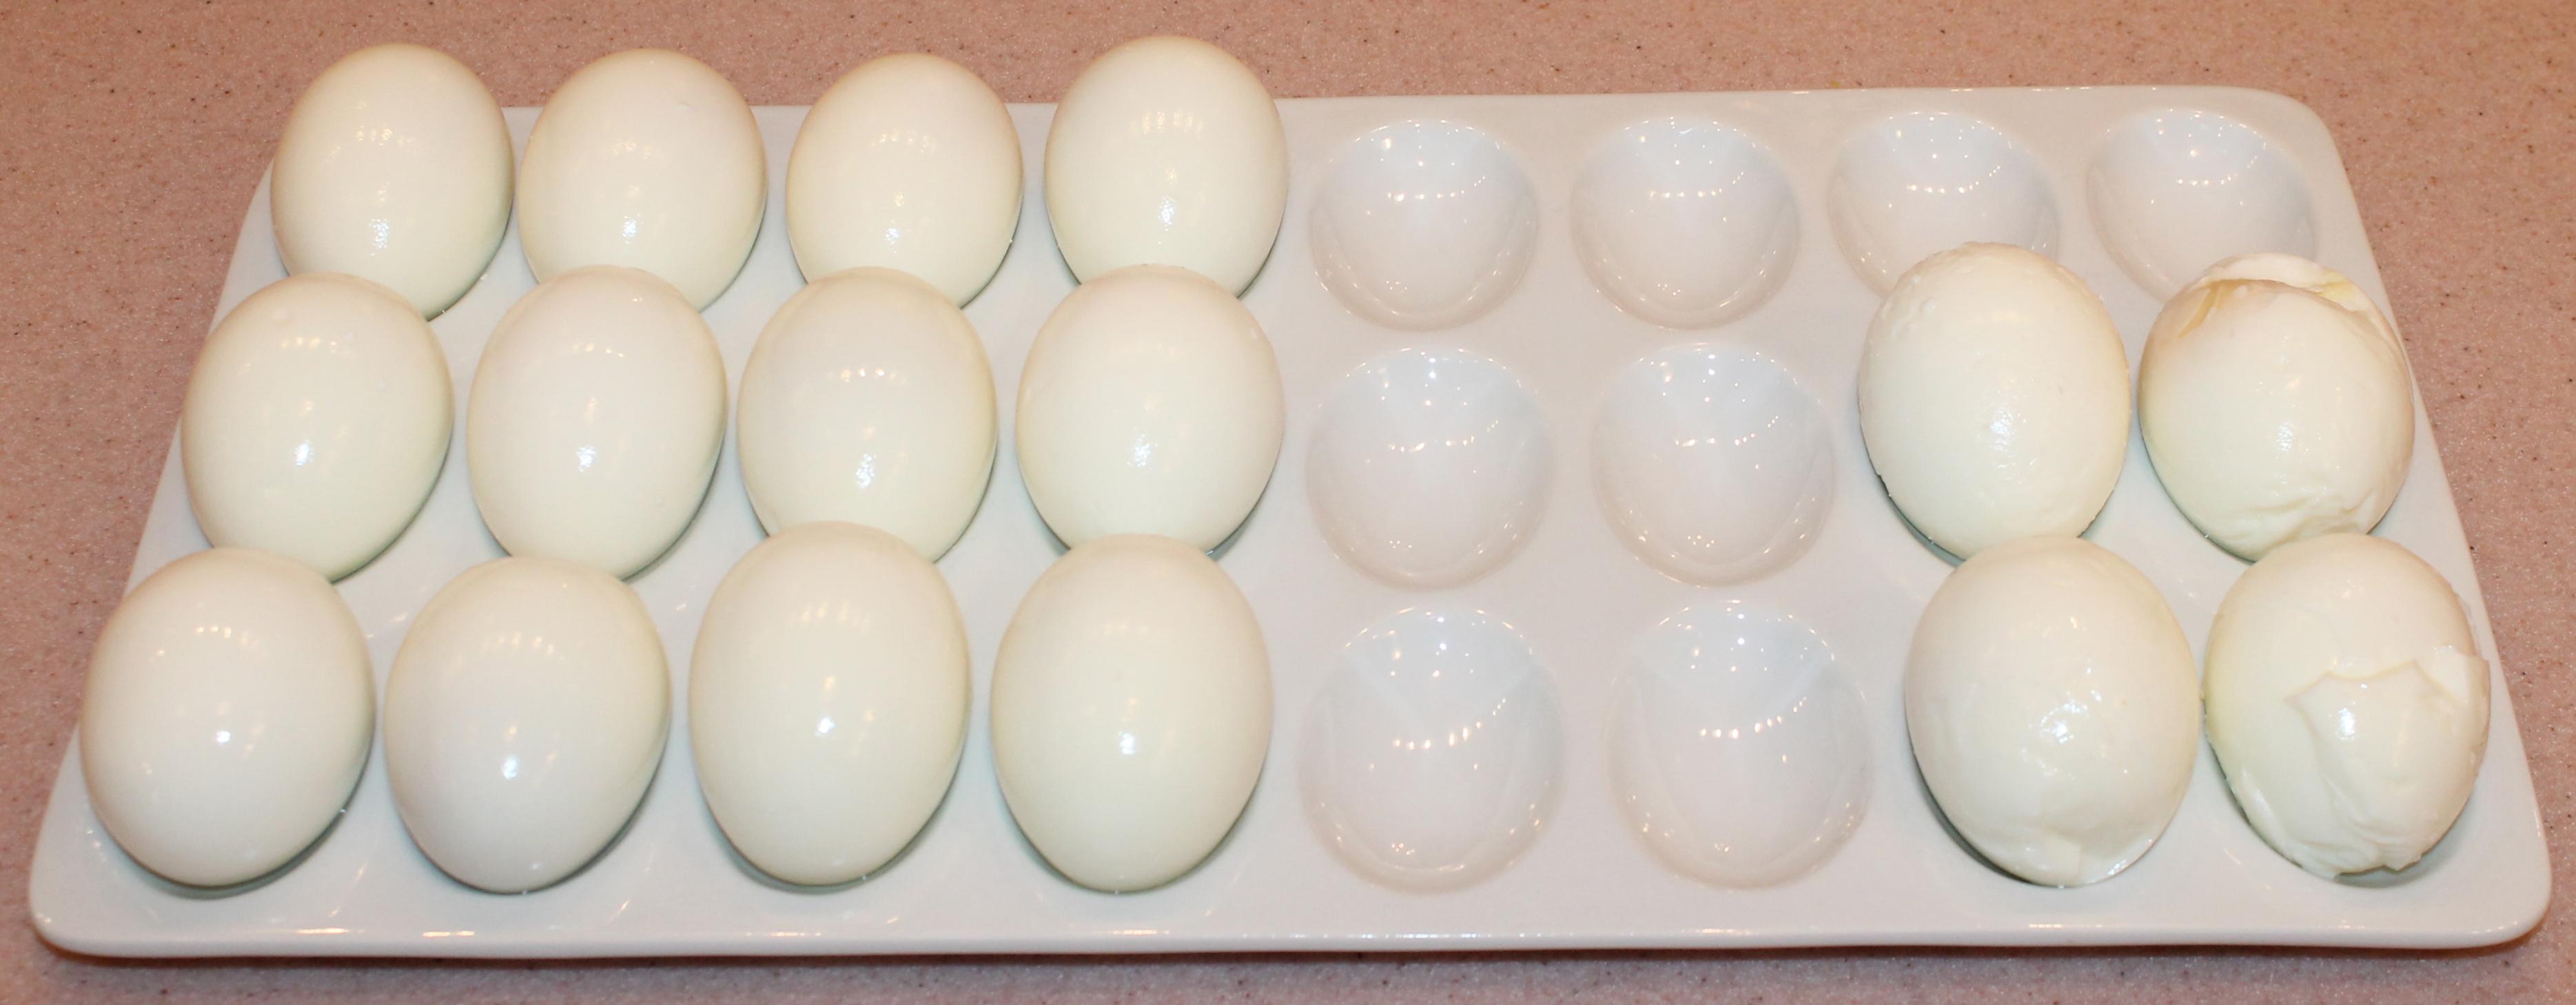 My Devilishly Hot-Russian-Mustard Deviled Eggs ~ - Kitchen Encounters